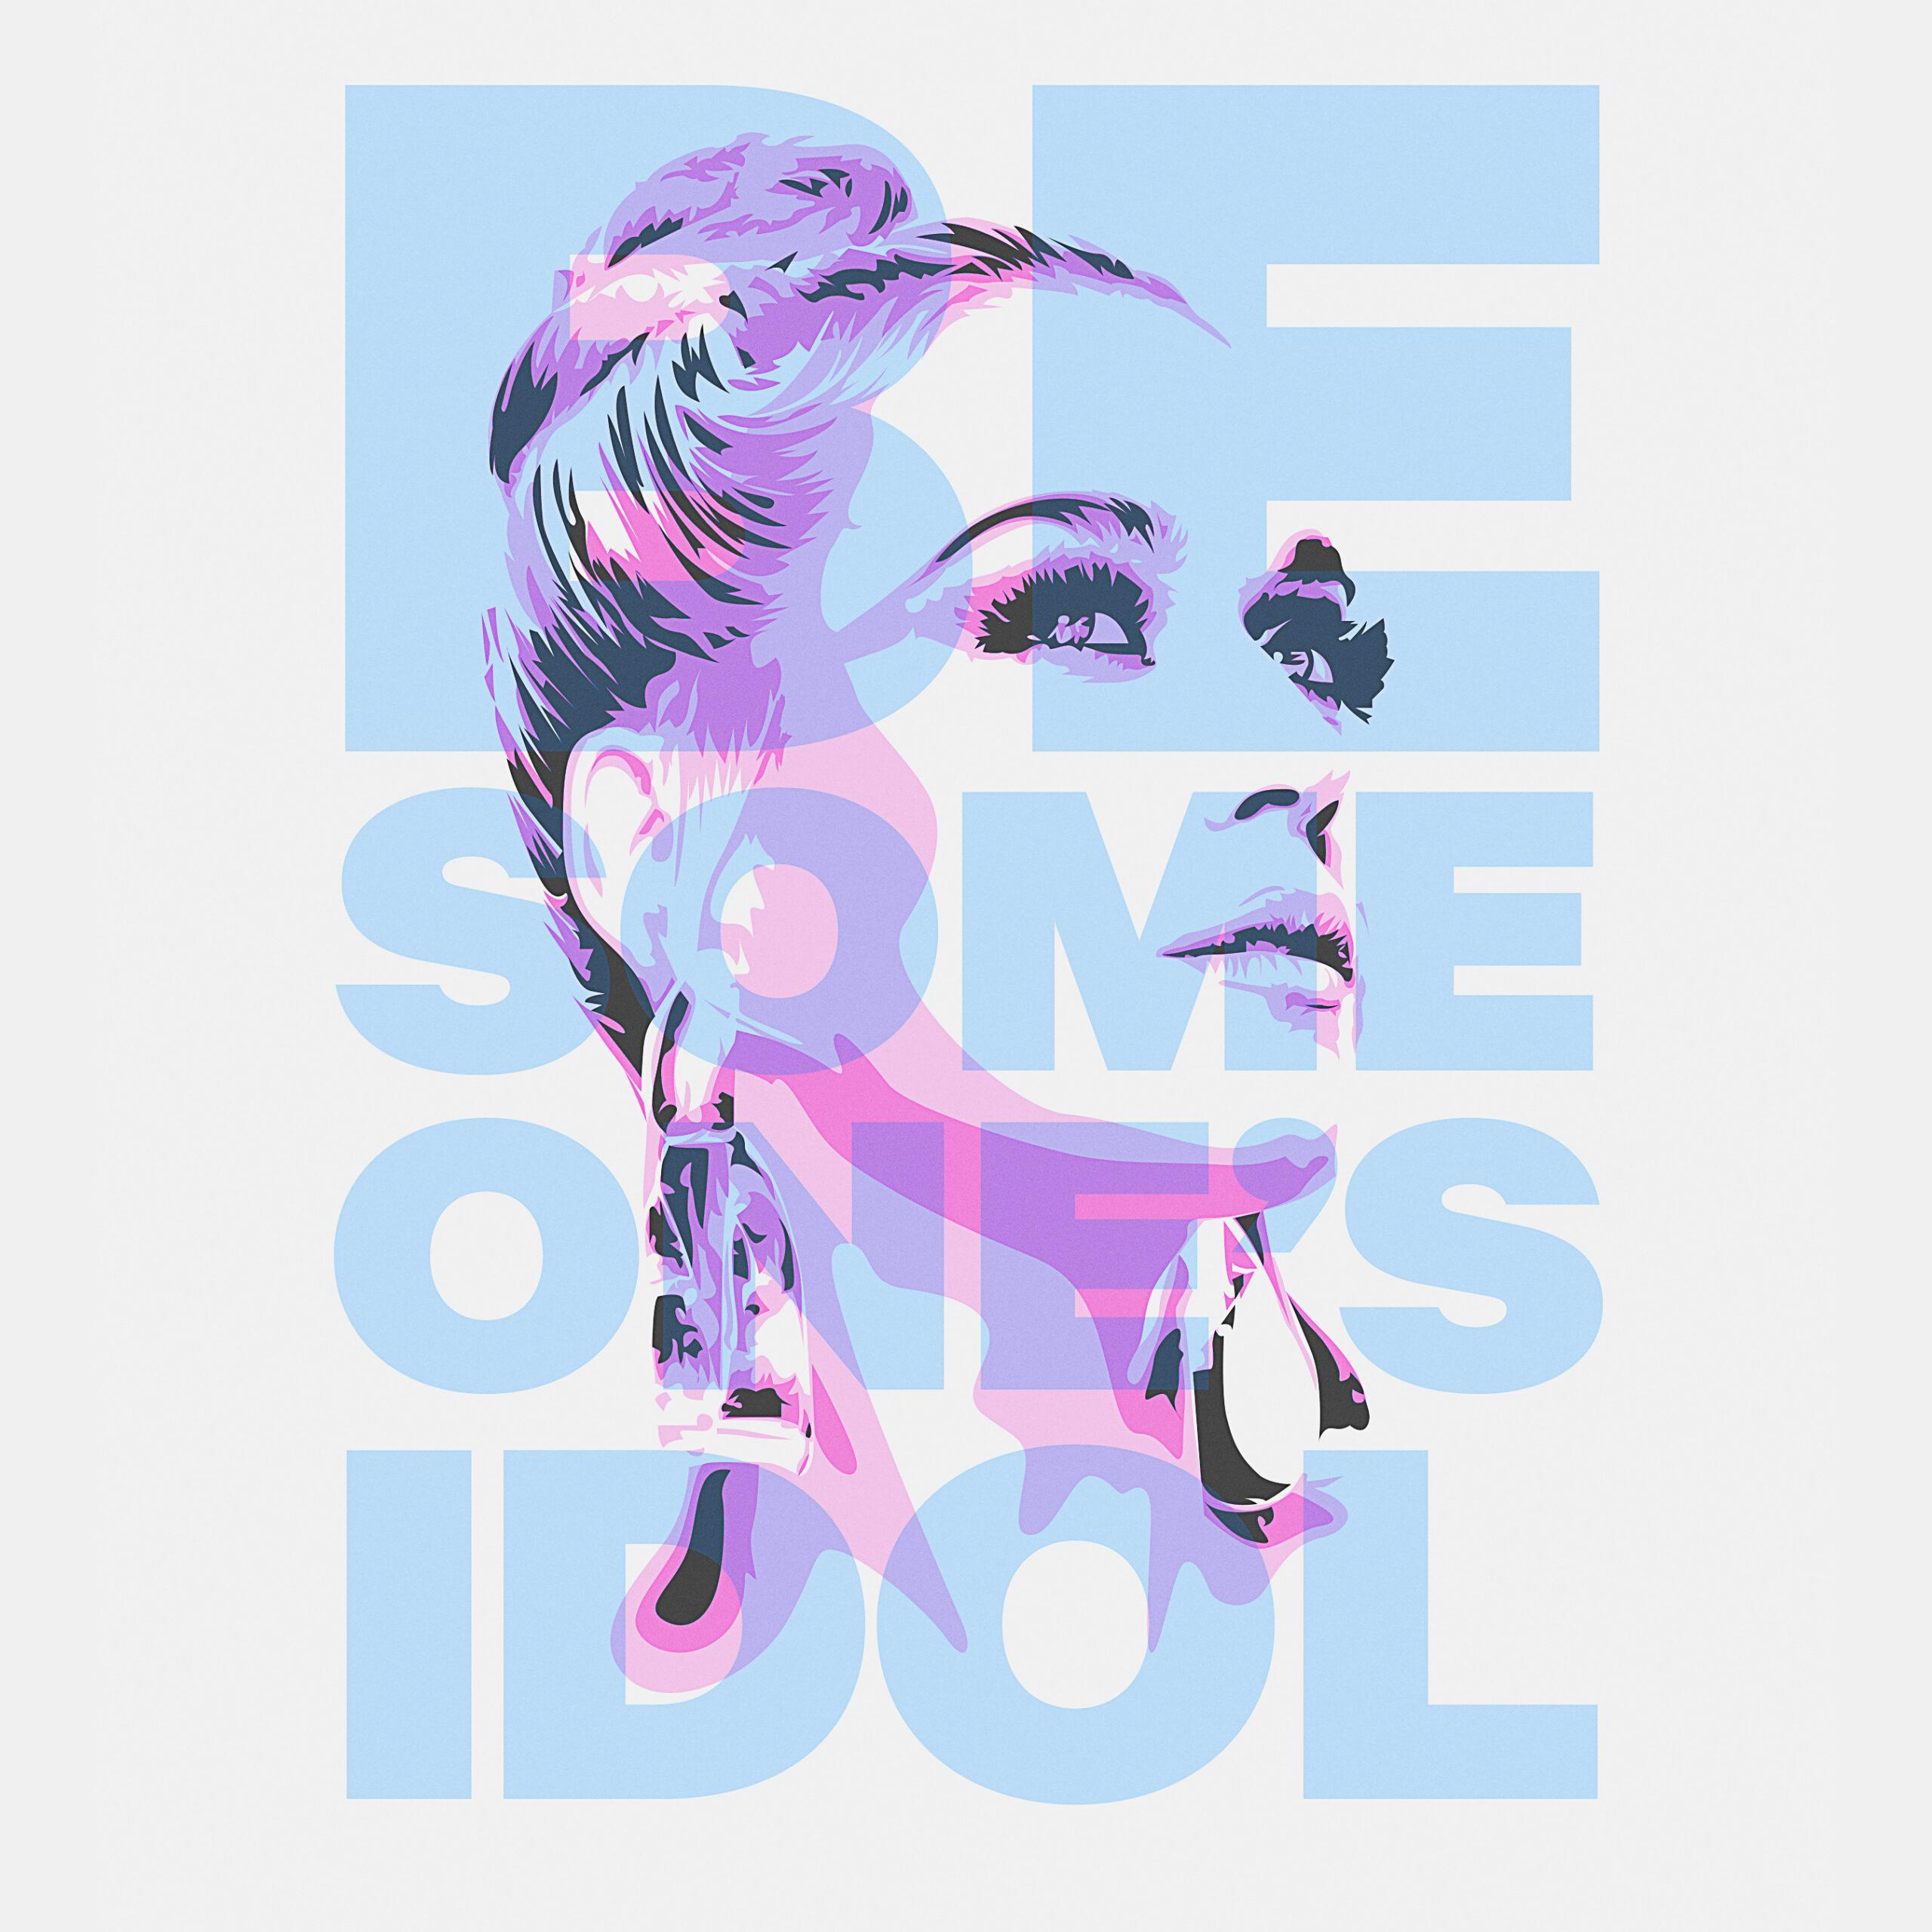 American Idol – Season 18